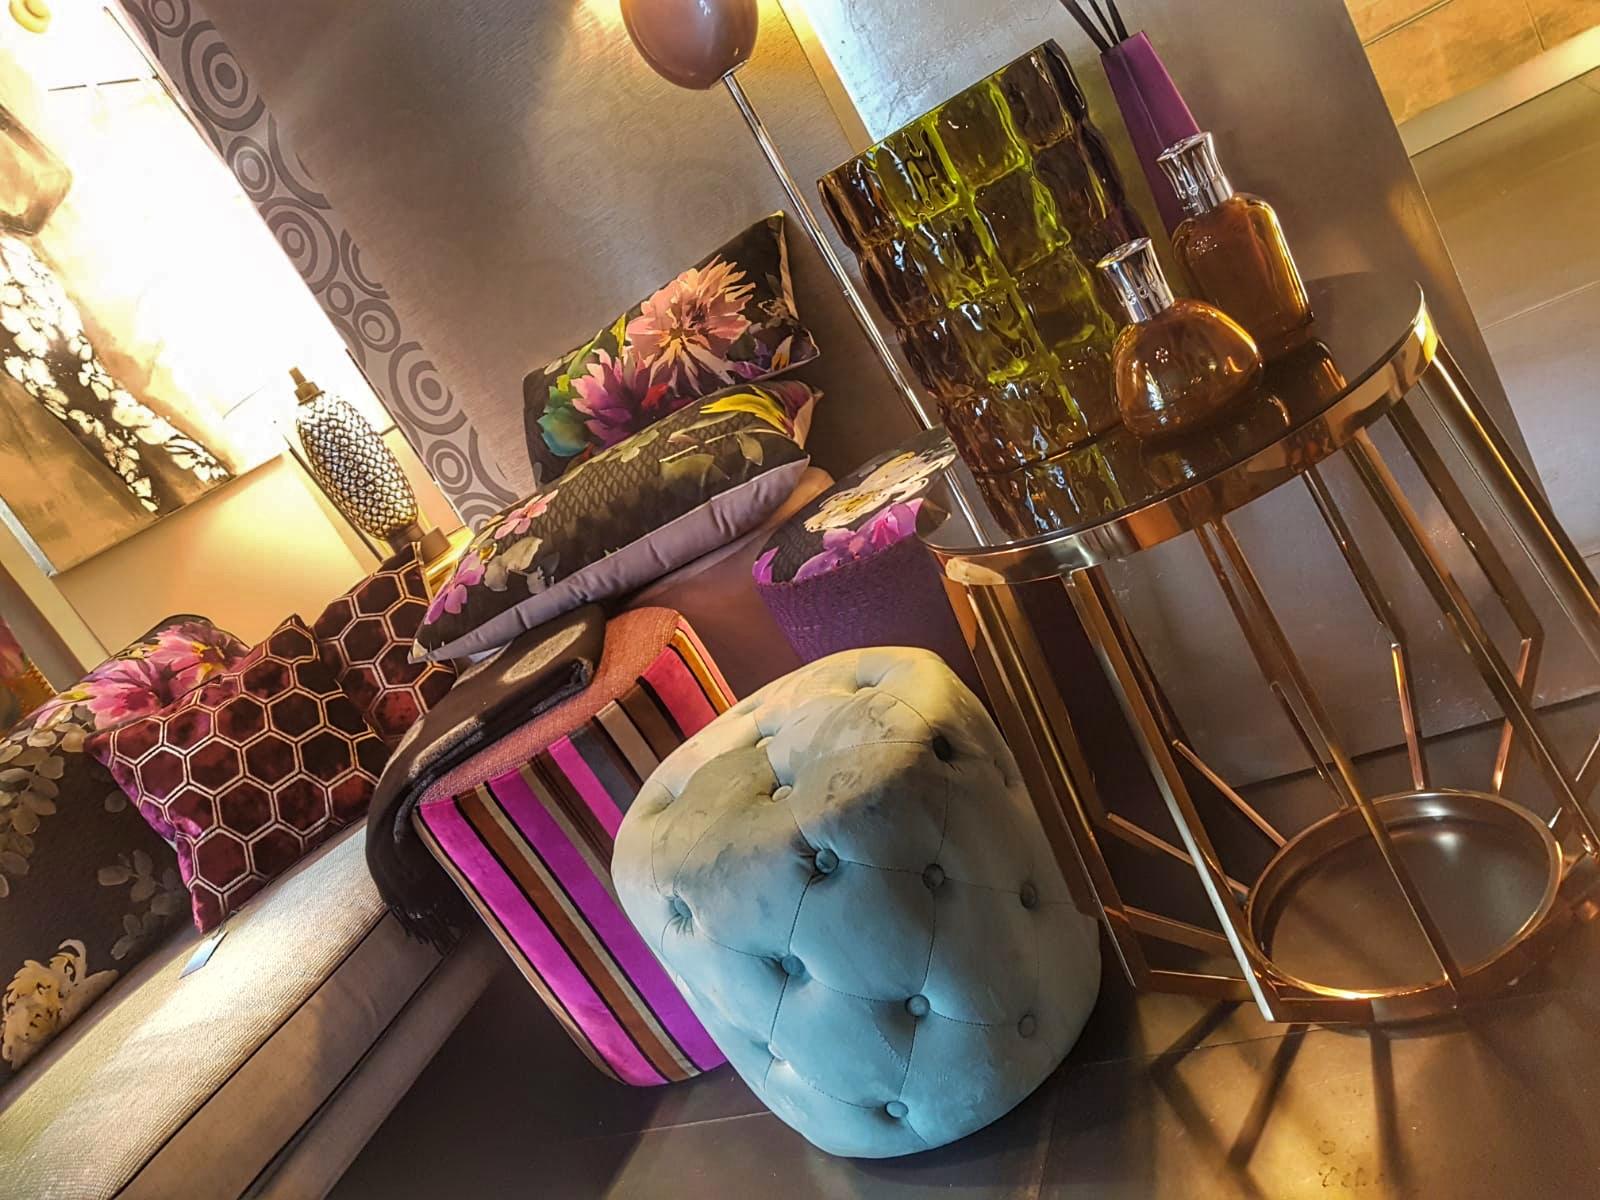 sara-rombola-pink-house-arredatrice-interior-designer-torino-talentieventi-17